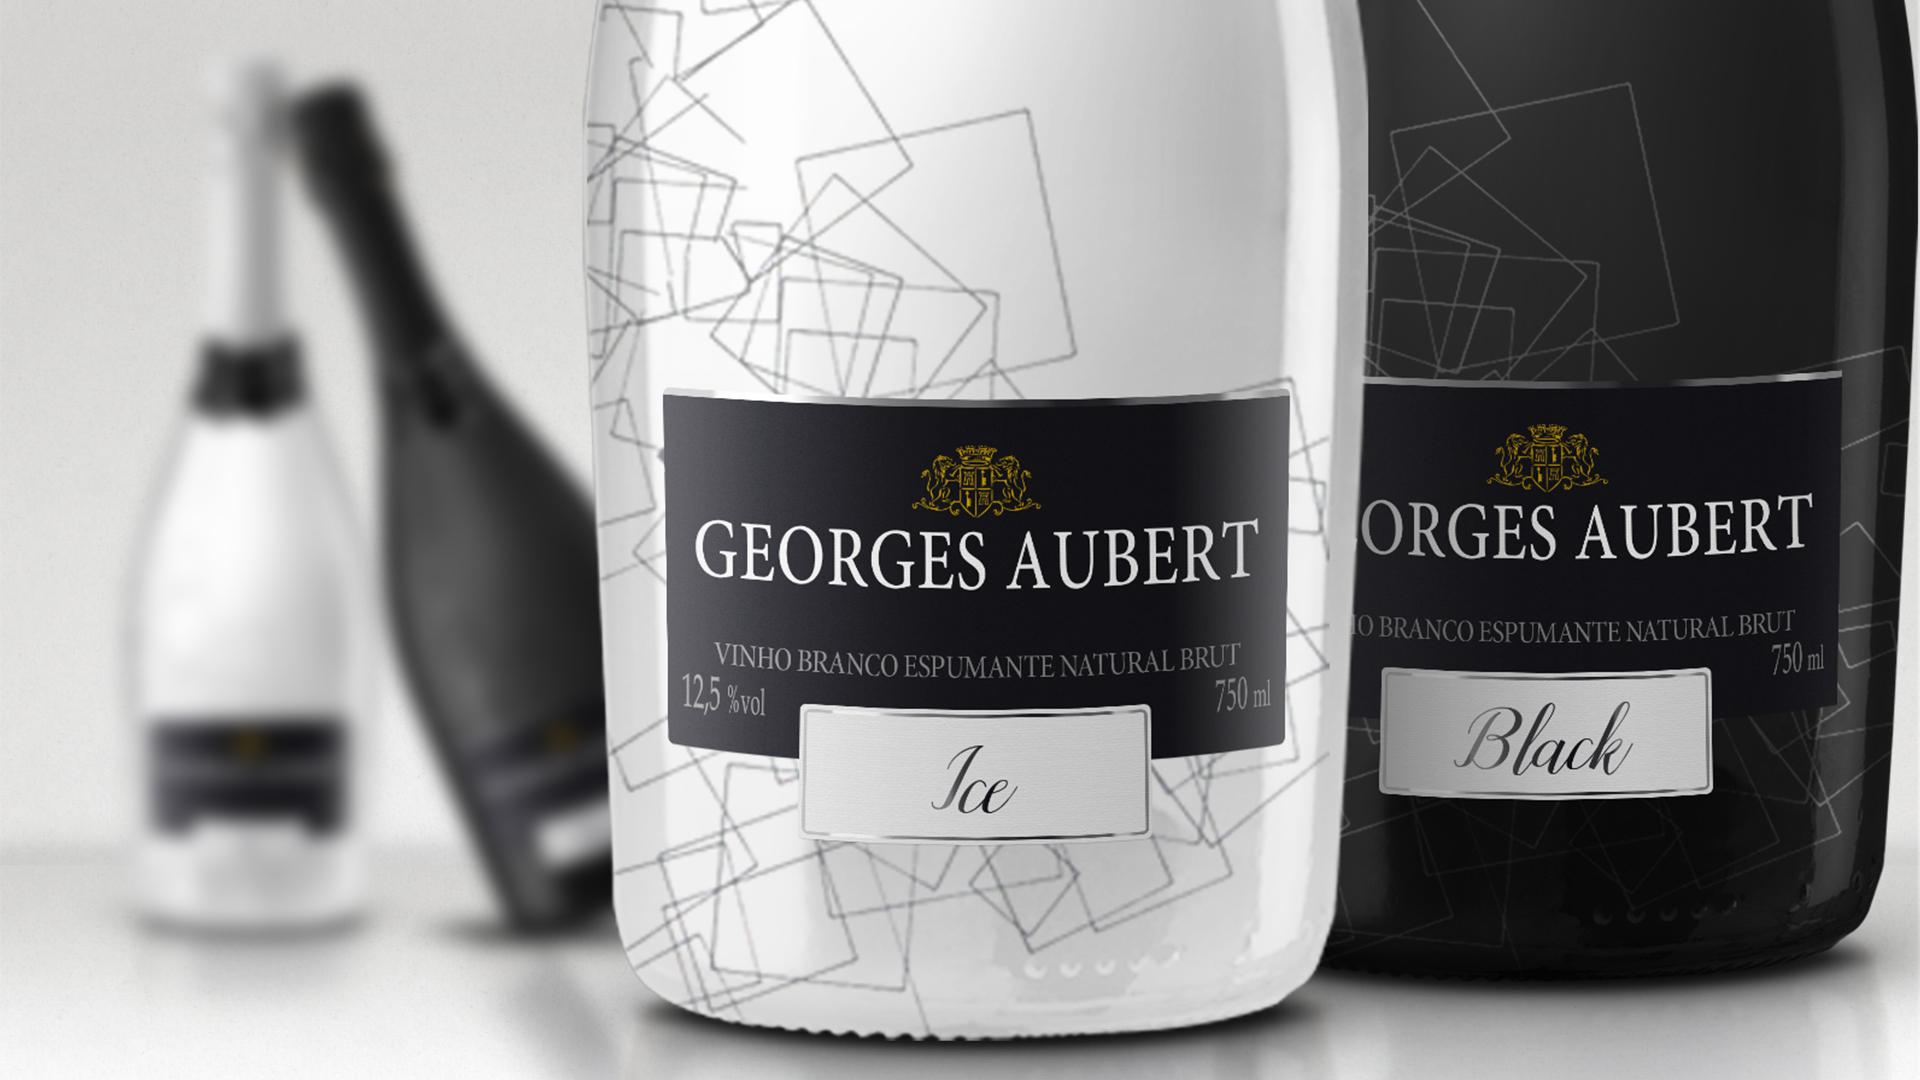 Garraga Georges Aubert